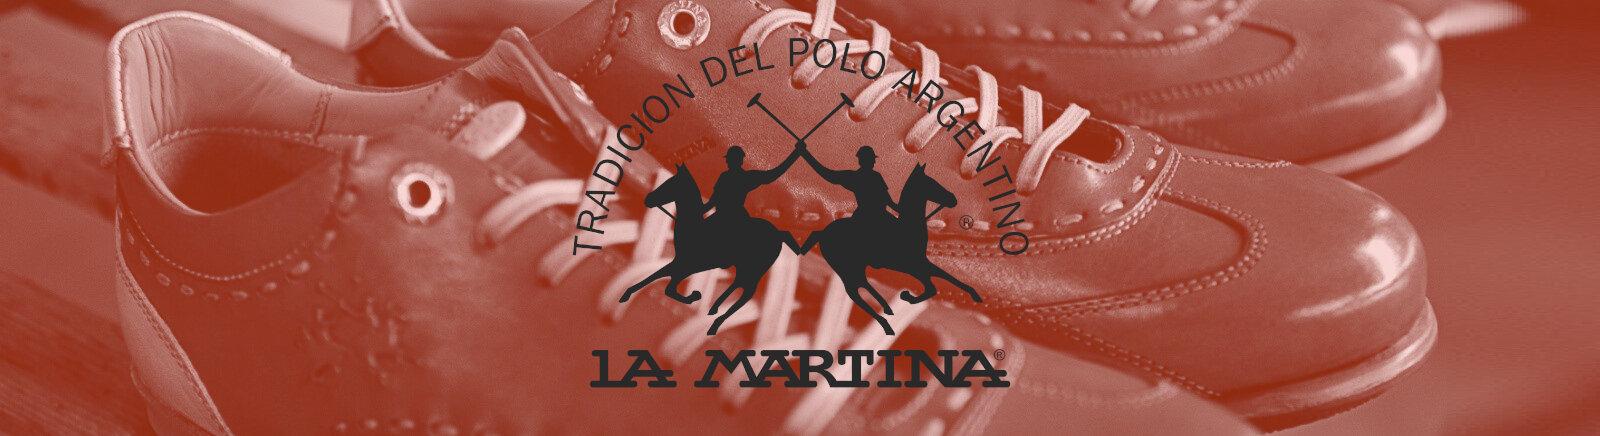 Prange: La Martina Januar Deals für Herren online shoppen